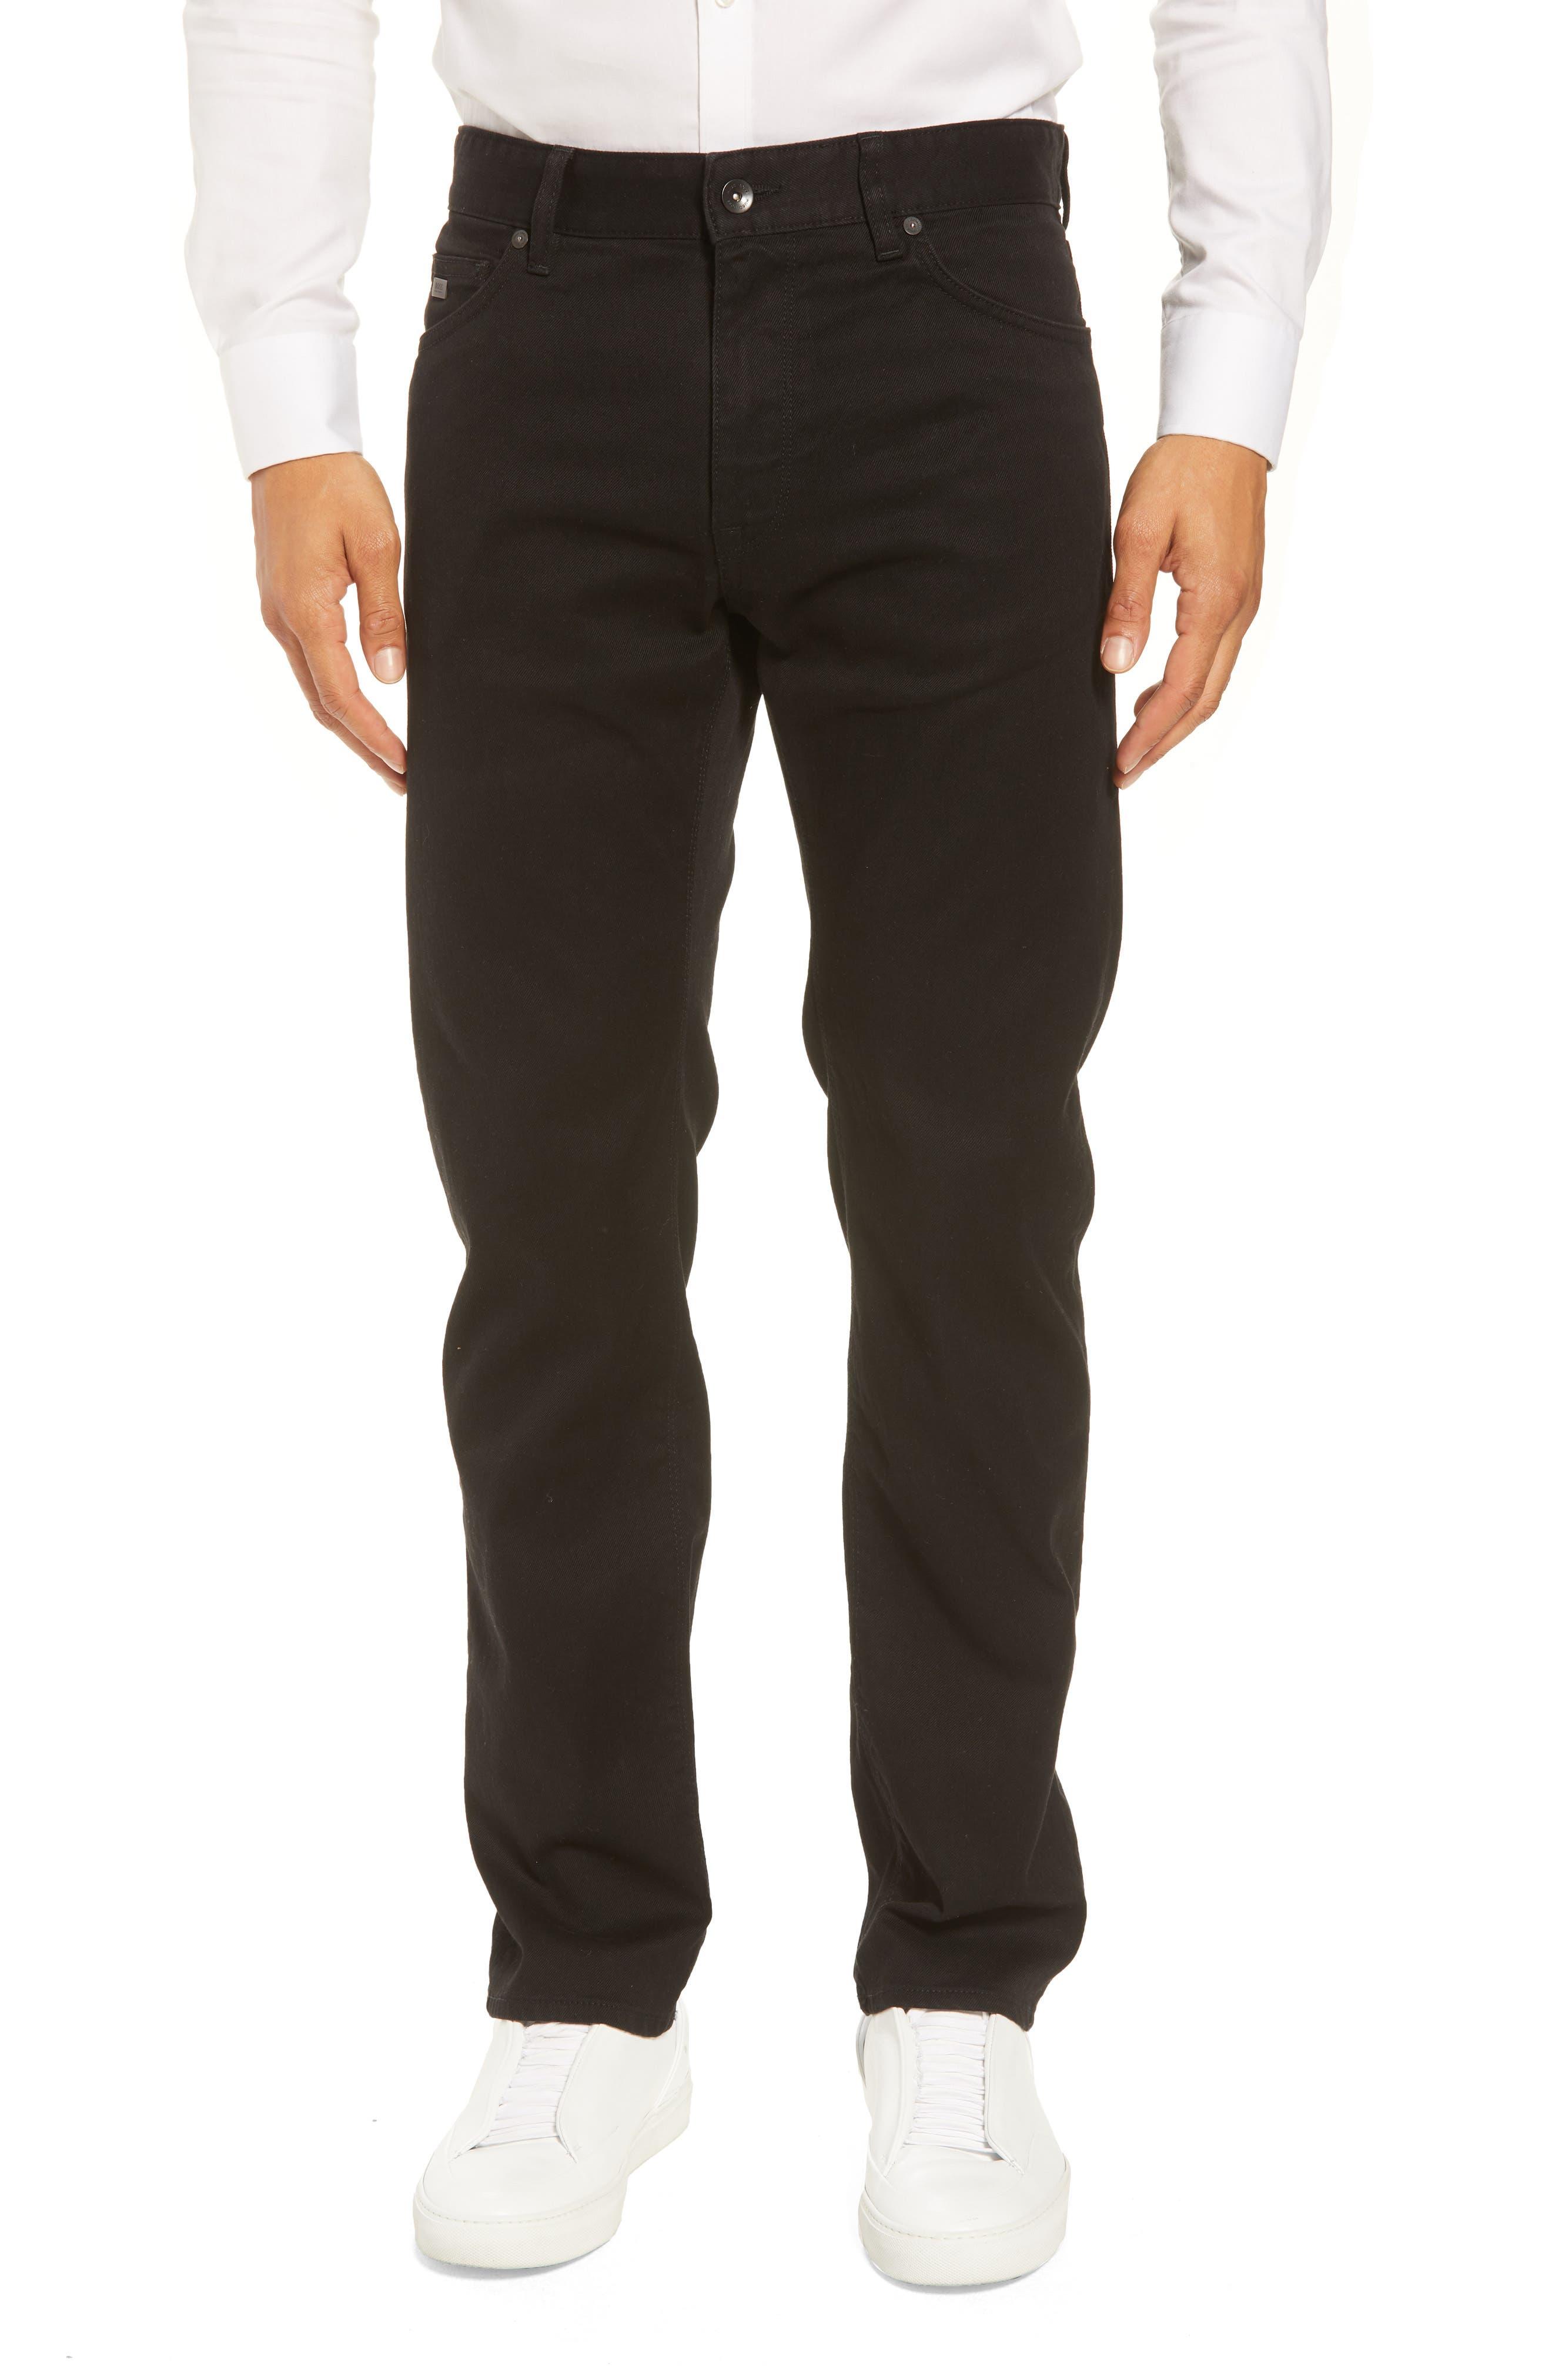 Maine Straight Leg Jeans,                             Main thumbnail 1, color,